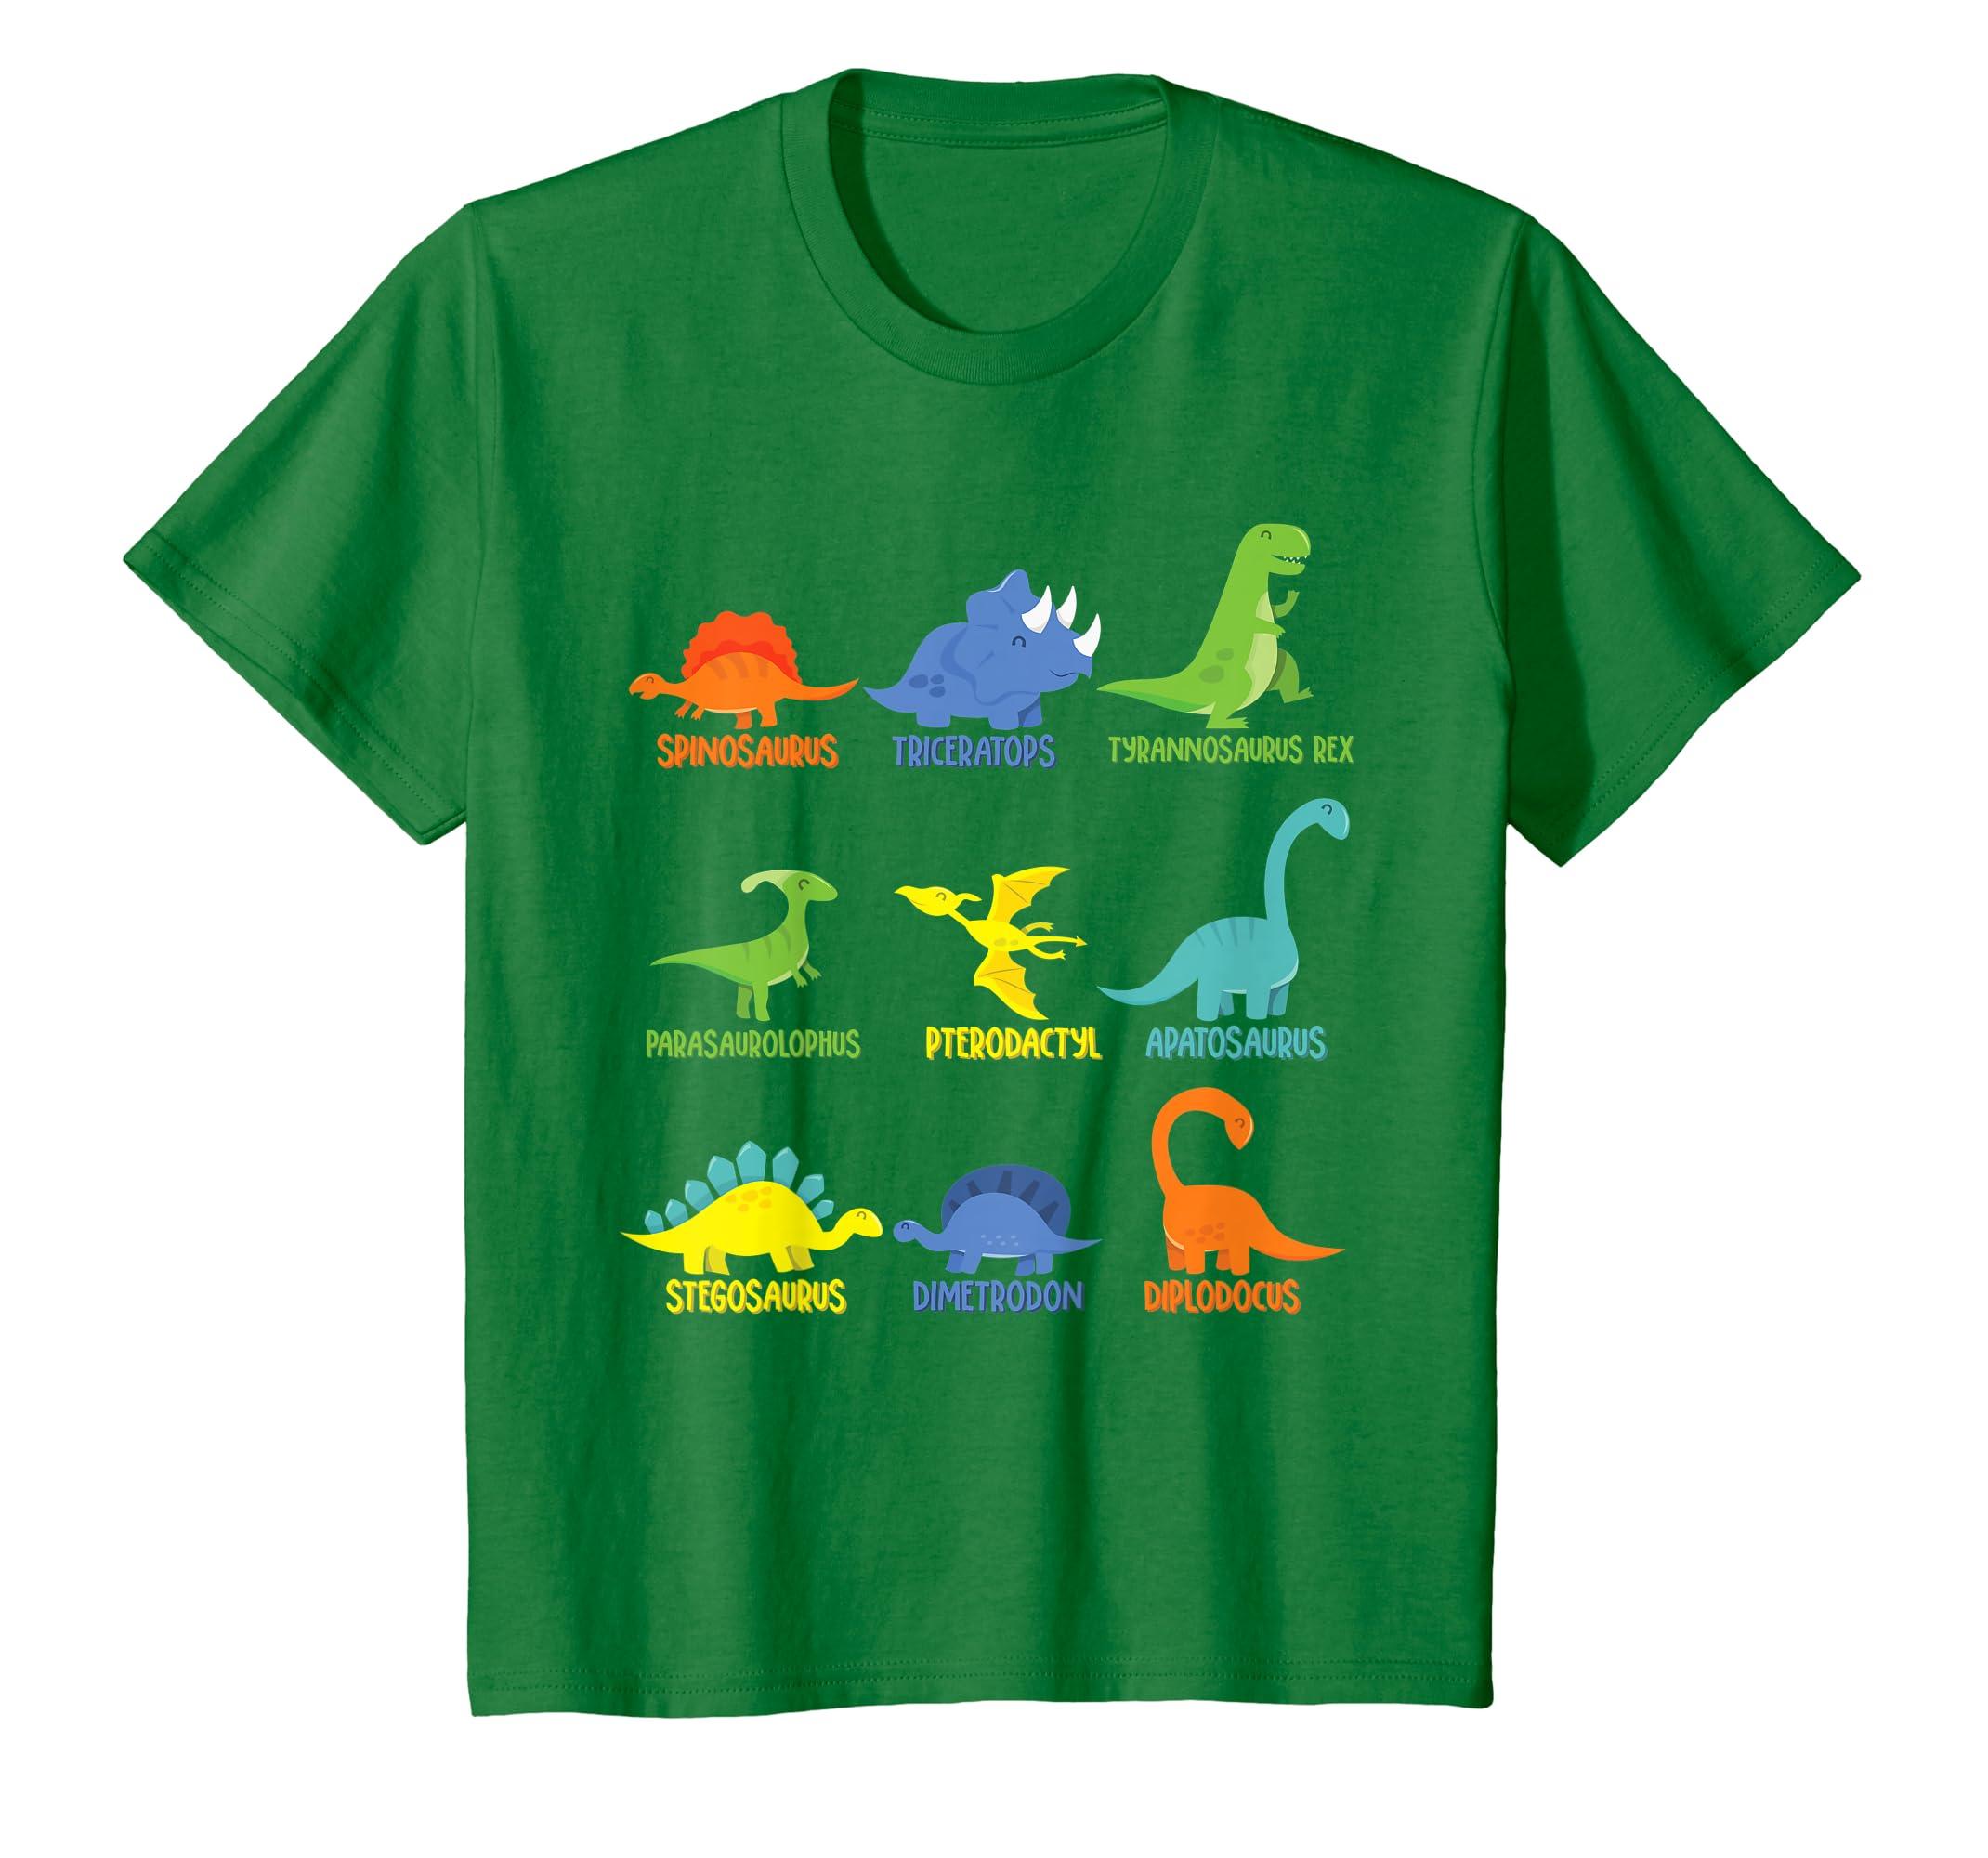 946024e6 Amazon.com: Cute Dinosaur Guide Graphic T-Shirt with Dino Names: Clothing